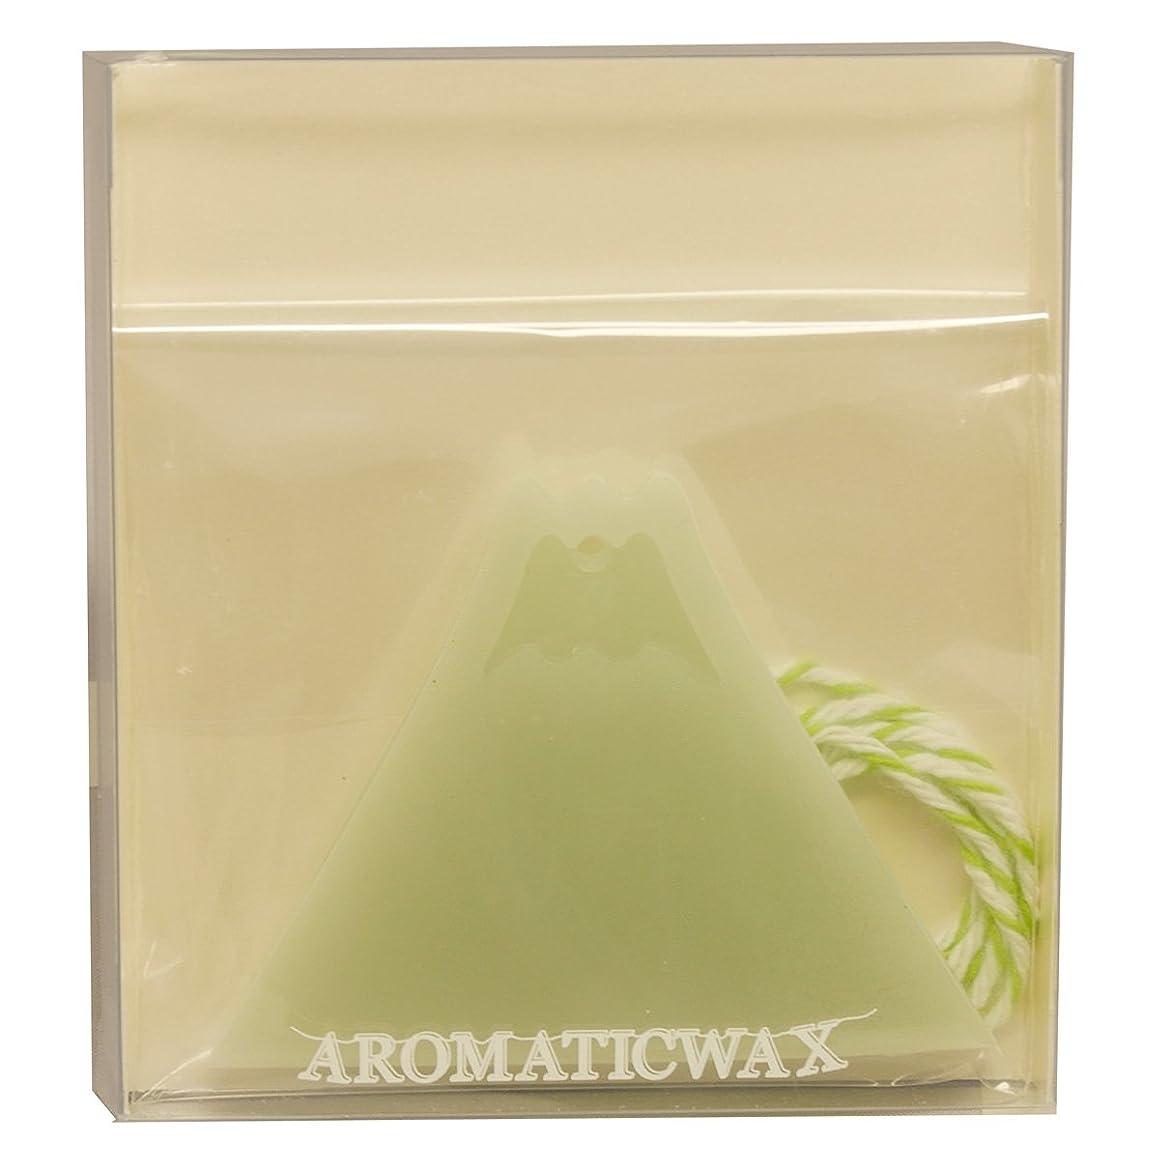 GRASSE TOKYO AROMATICWAXチャーム「富士山」(GR) レモングラス アロマティックワックス グラーストウキョウ